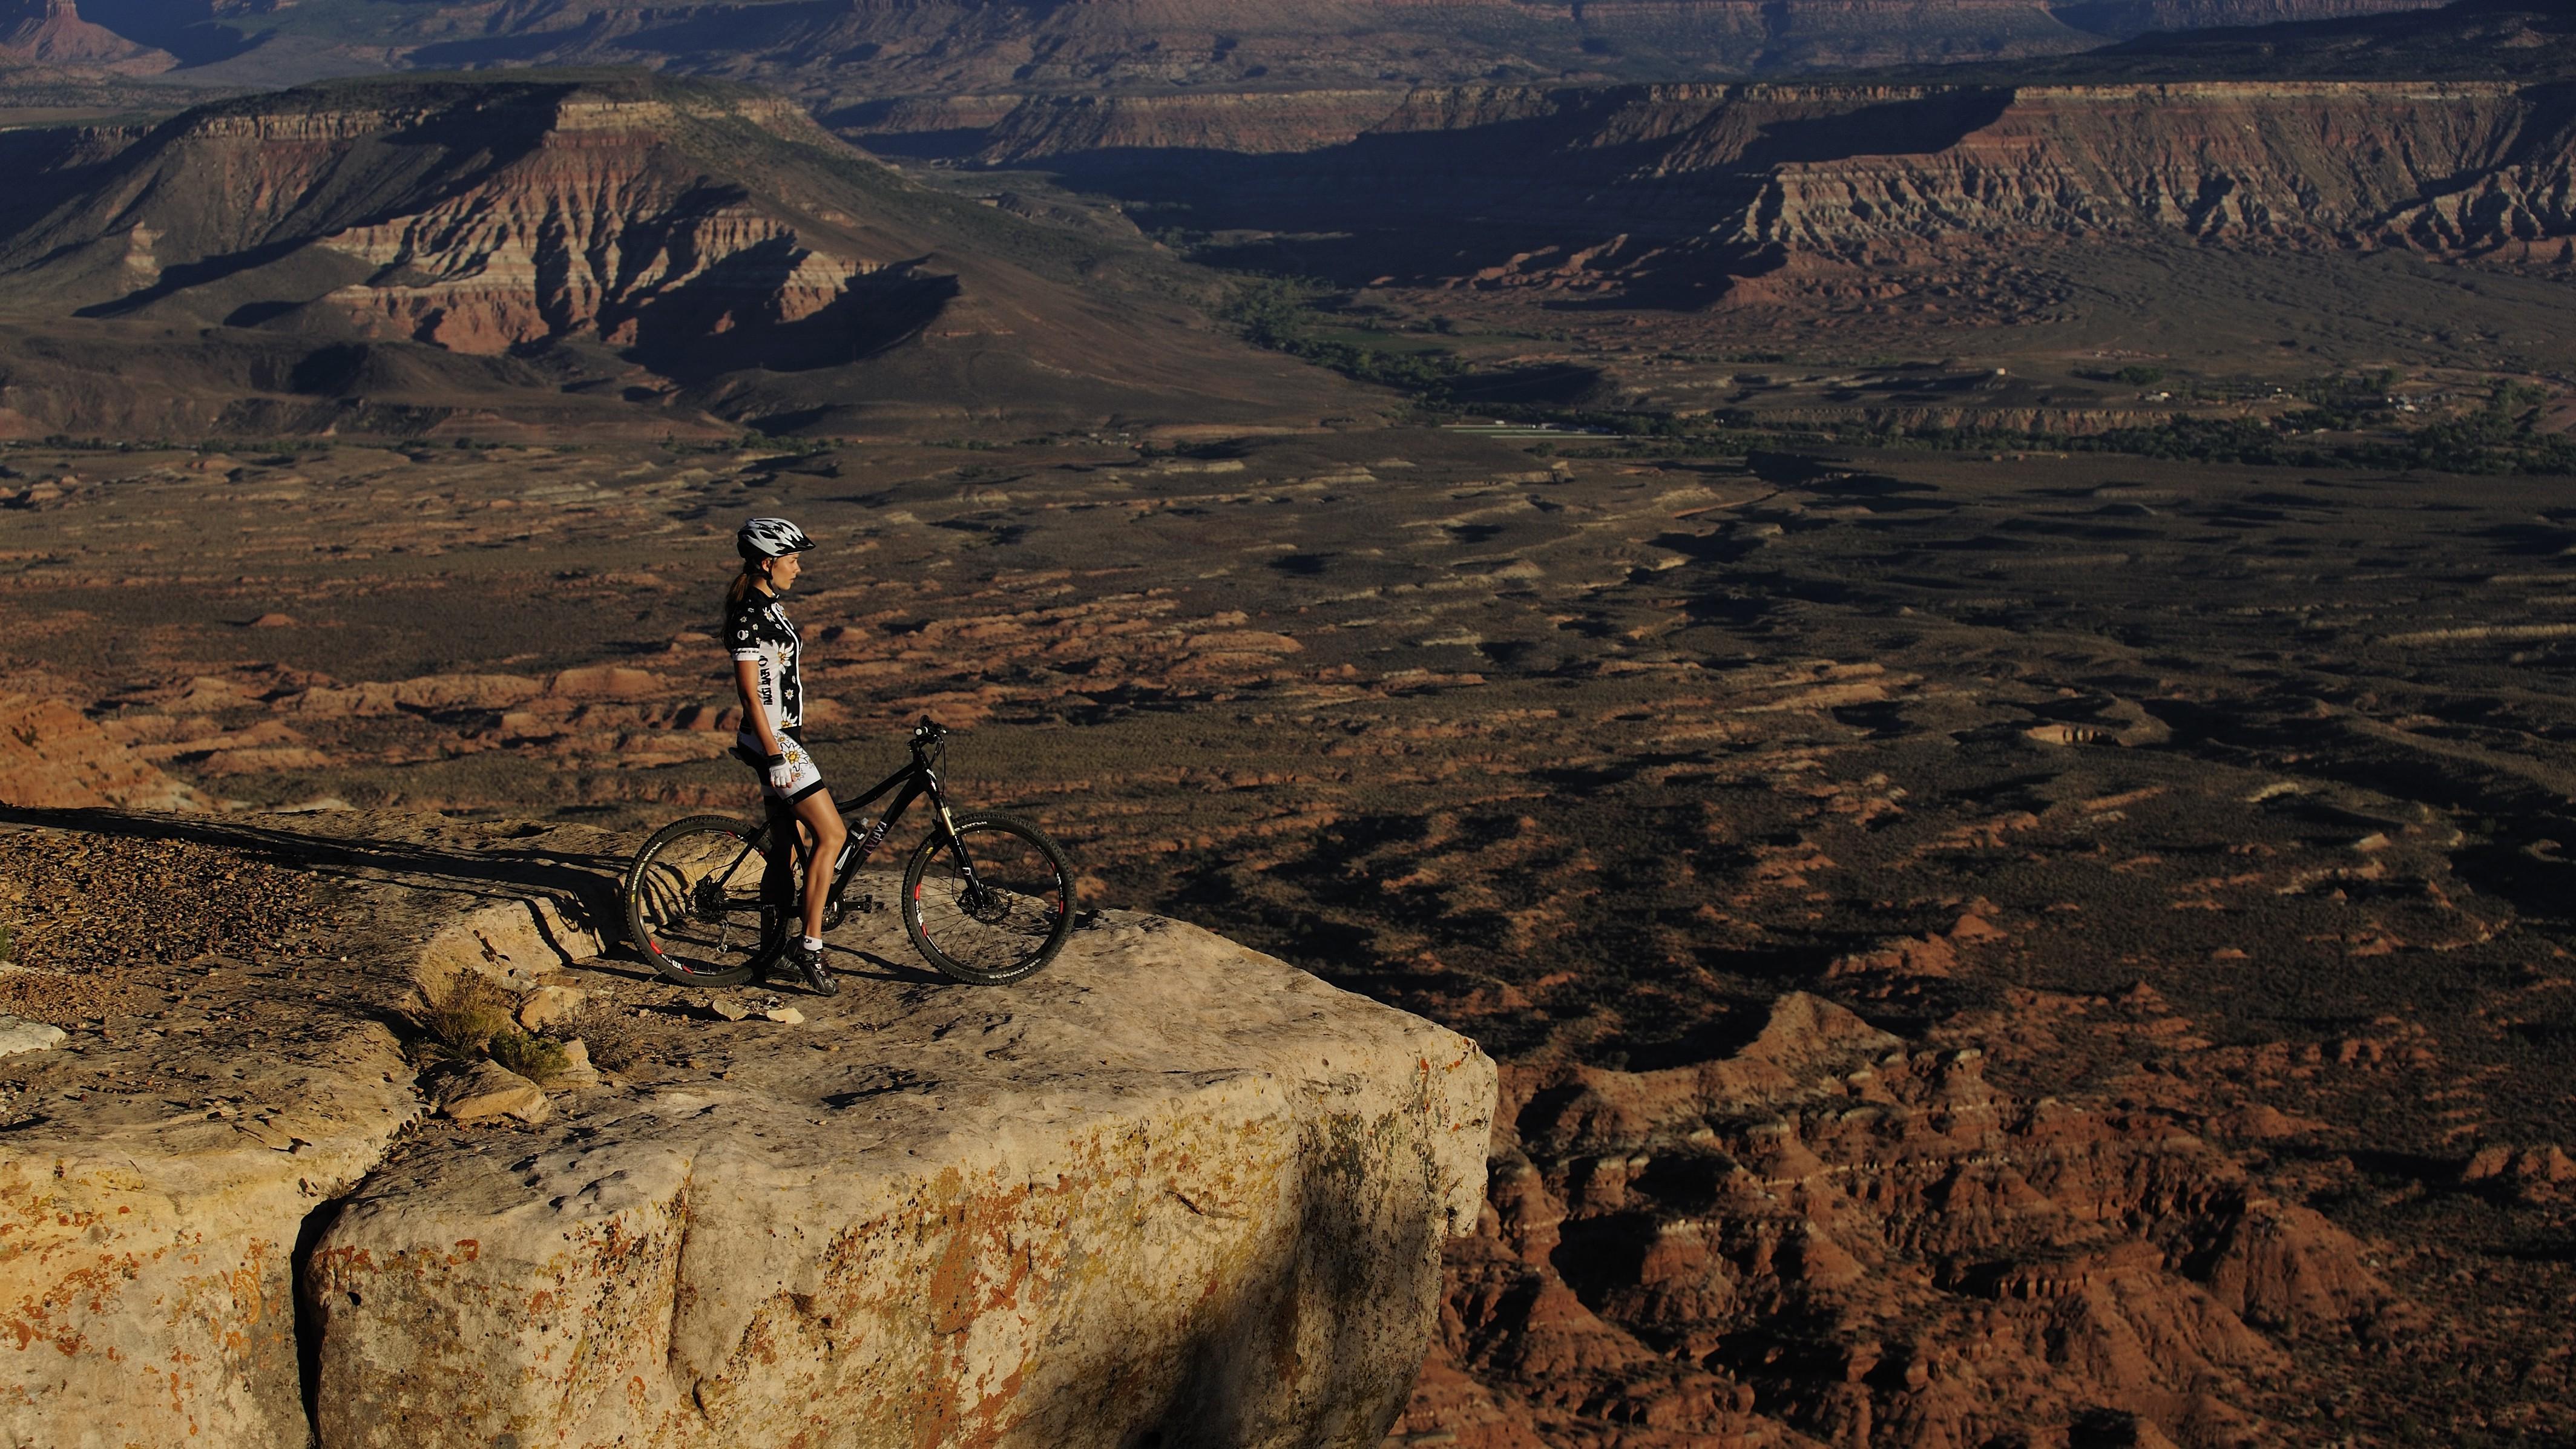 Wallpaper Landscape Mountains Women Outdoors Rock Bicycle